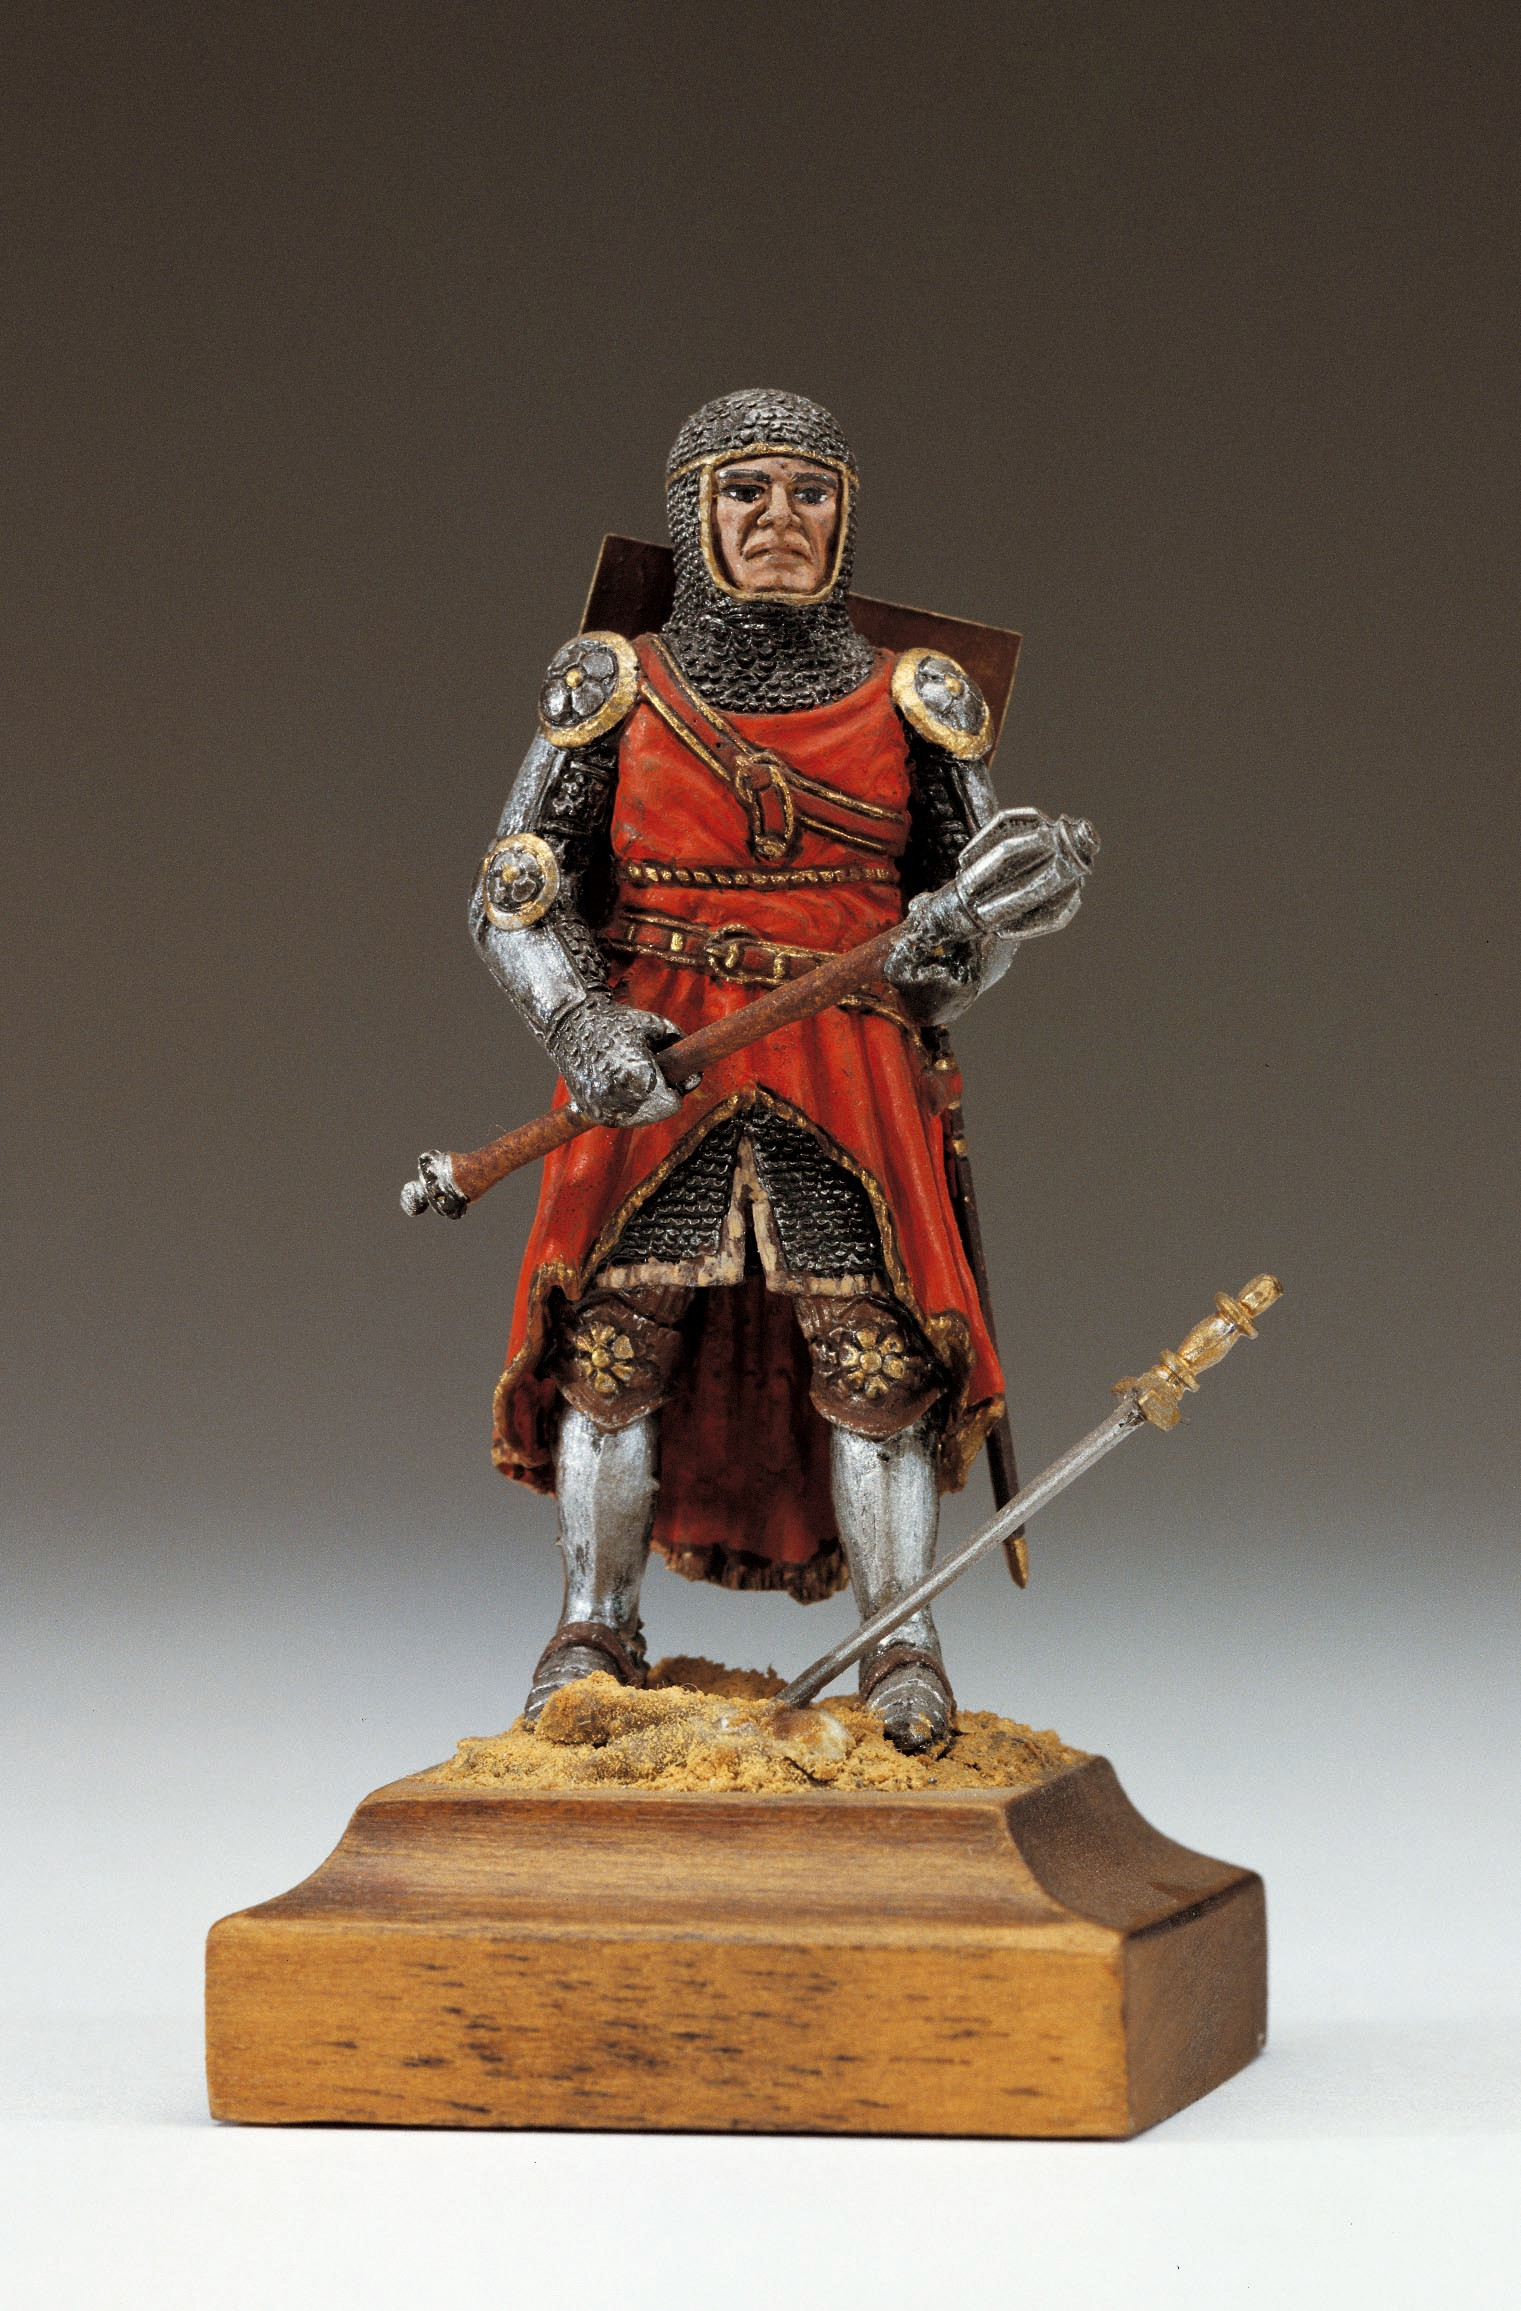 English Knight Figurine, XIV Century (Amati)